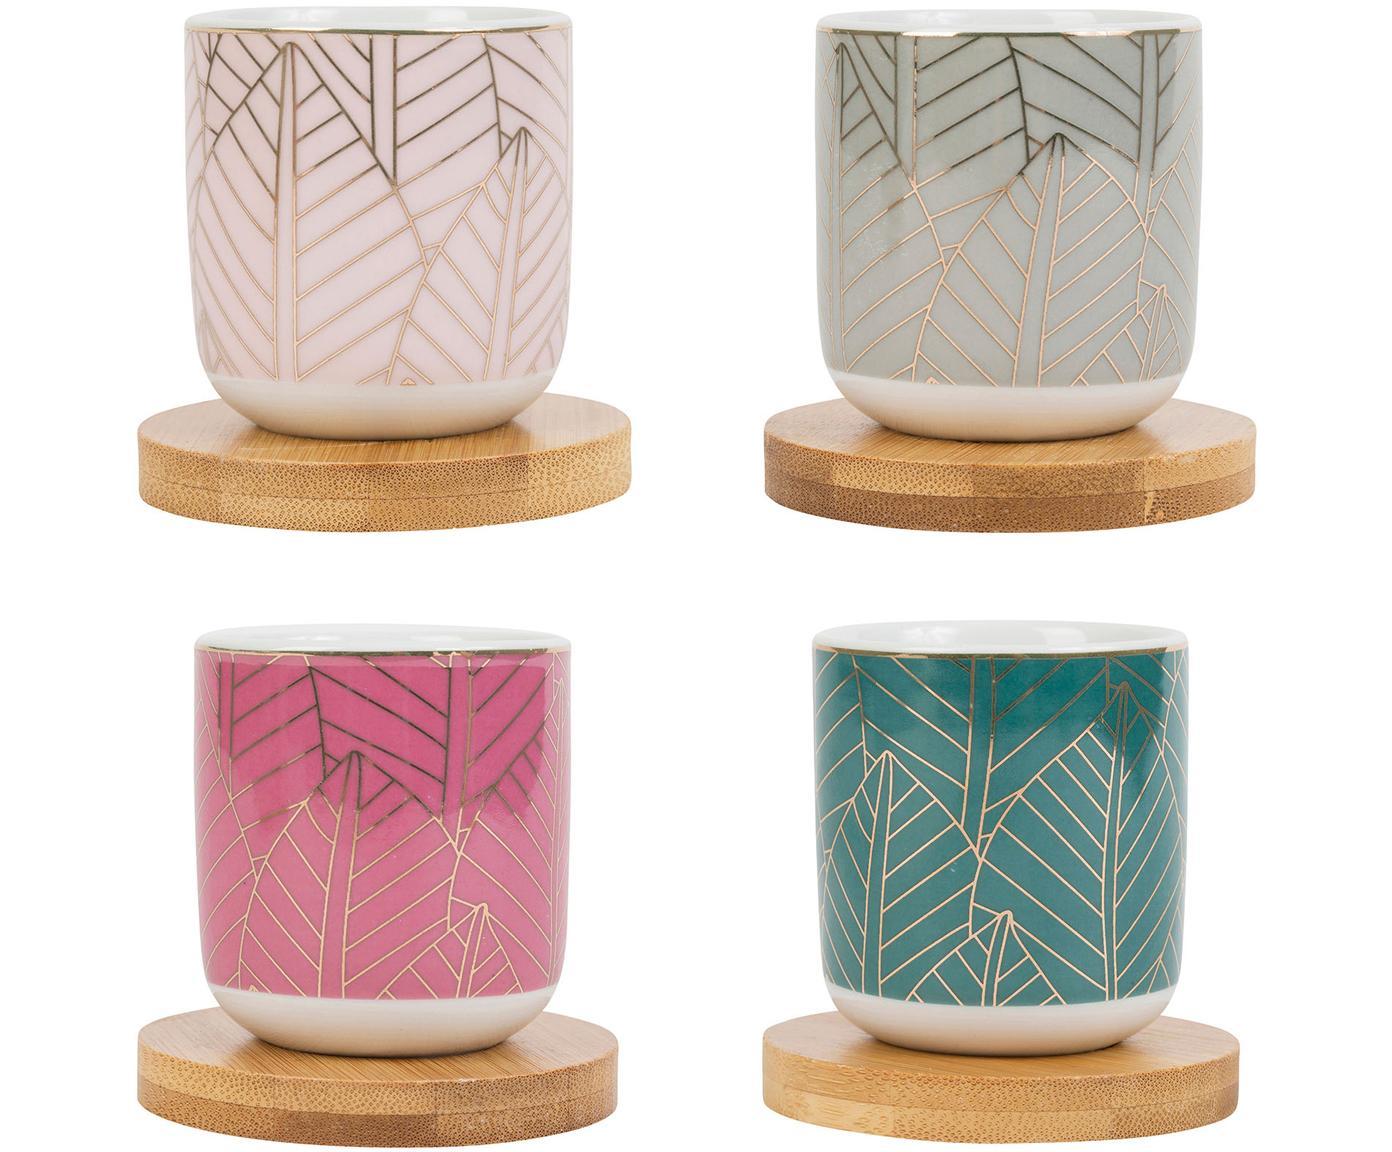 XS Becher mit Bambusuntersetzer Orfe, 8er-Set, Becher: Porzellan, Untersetzer: Bambus, Mehrfarbig, Ø 6 x H 7 cm